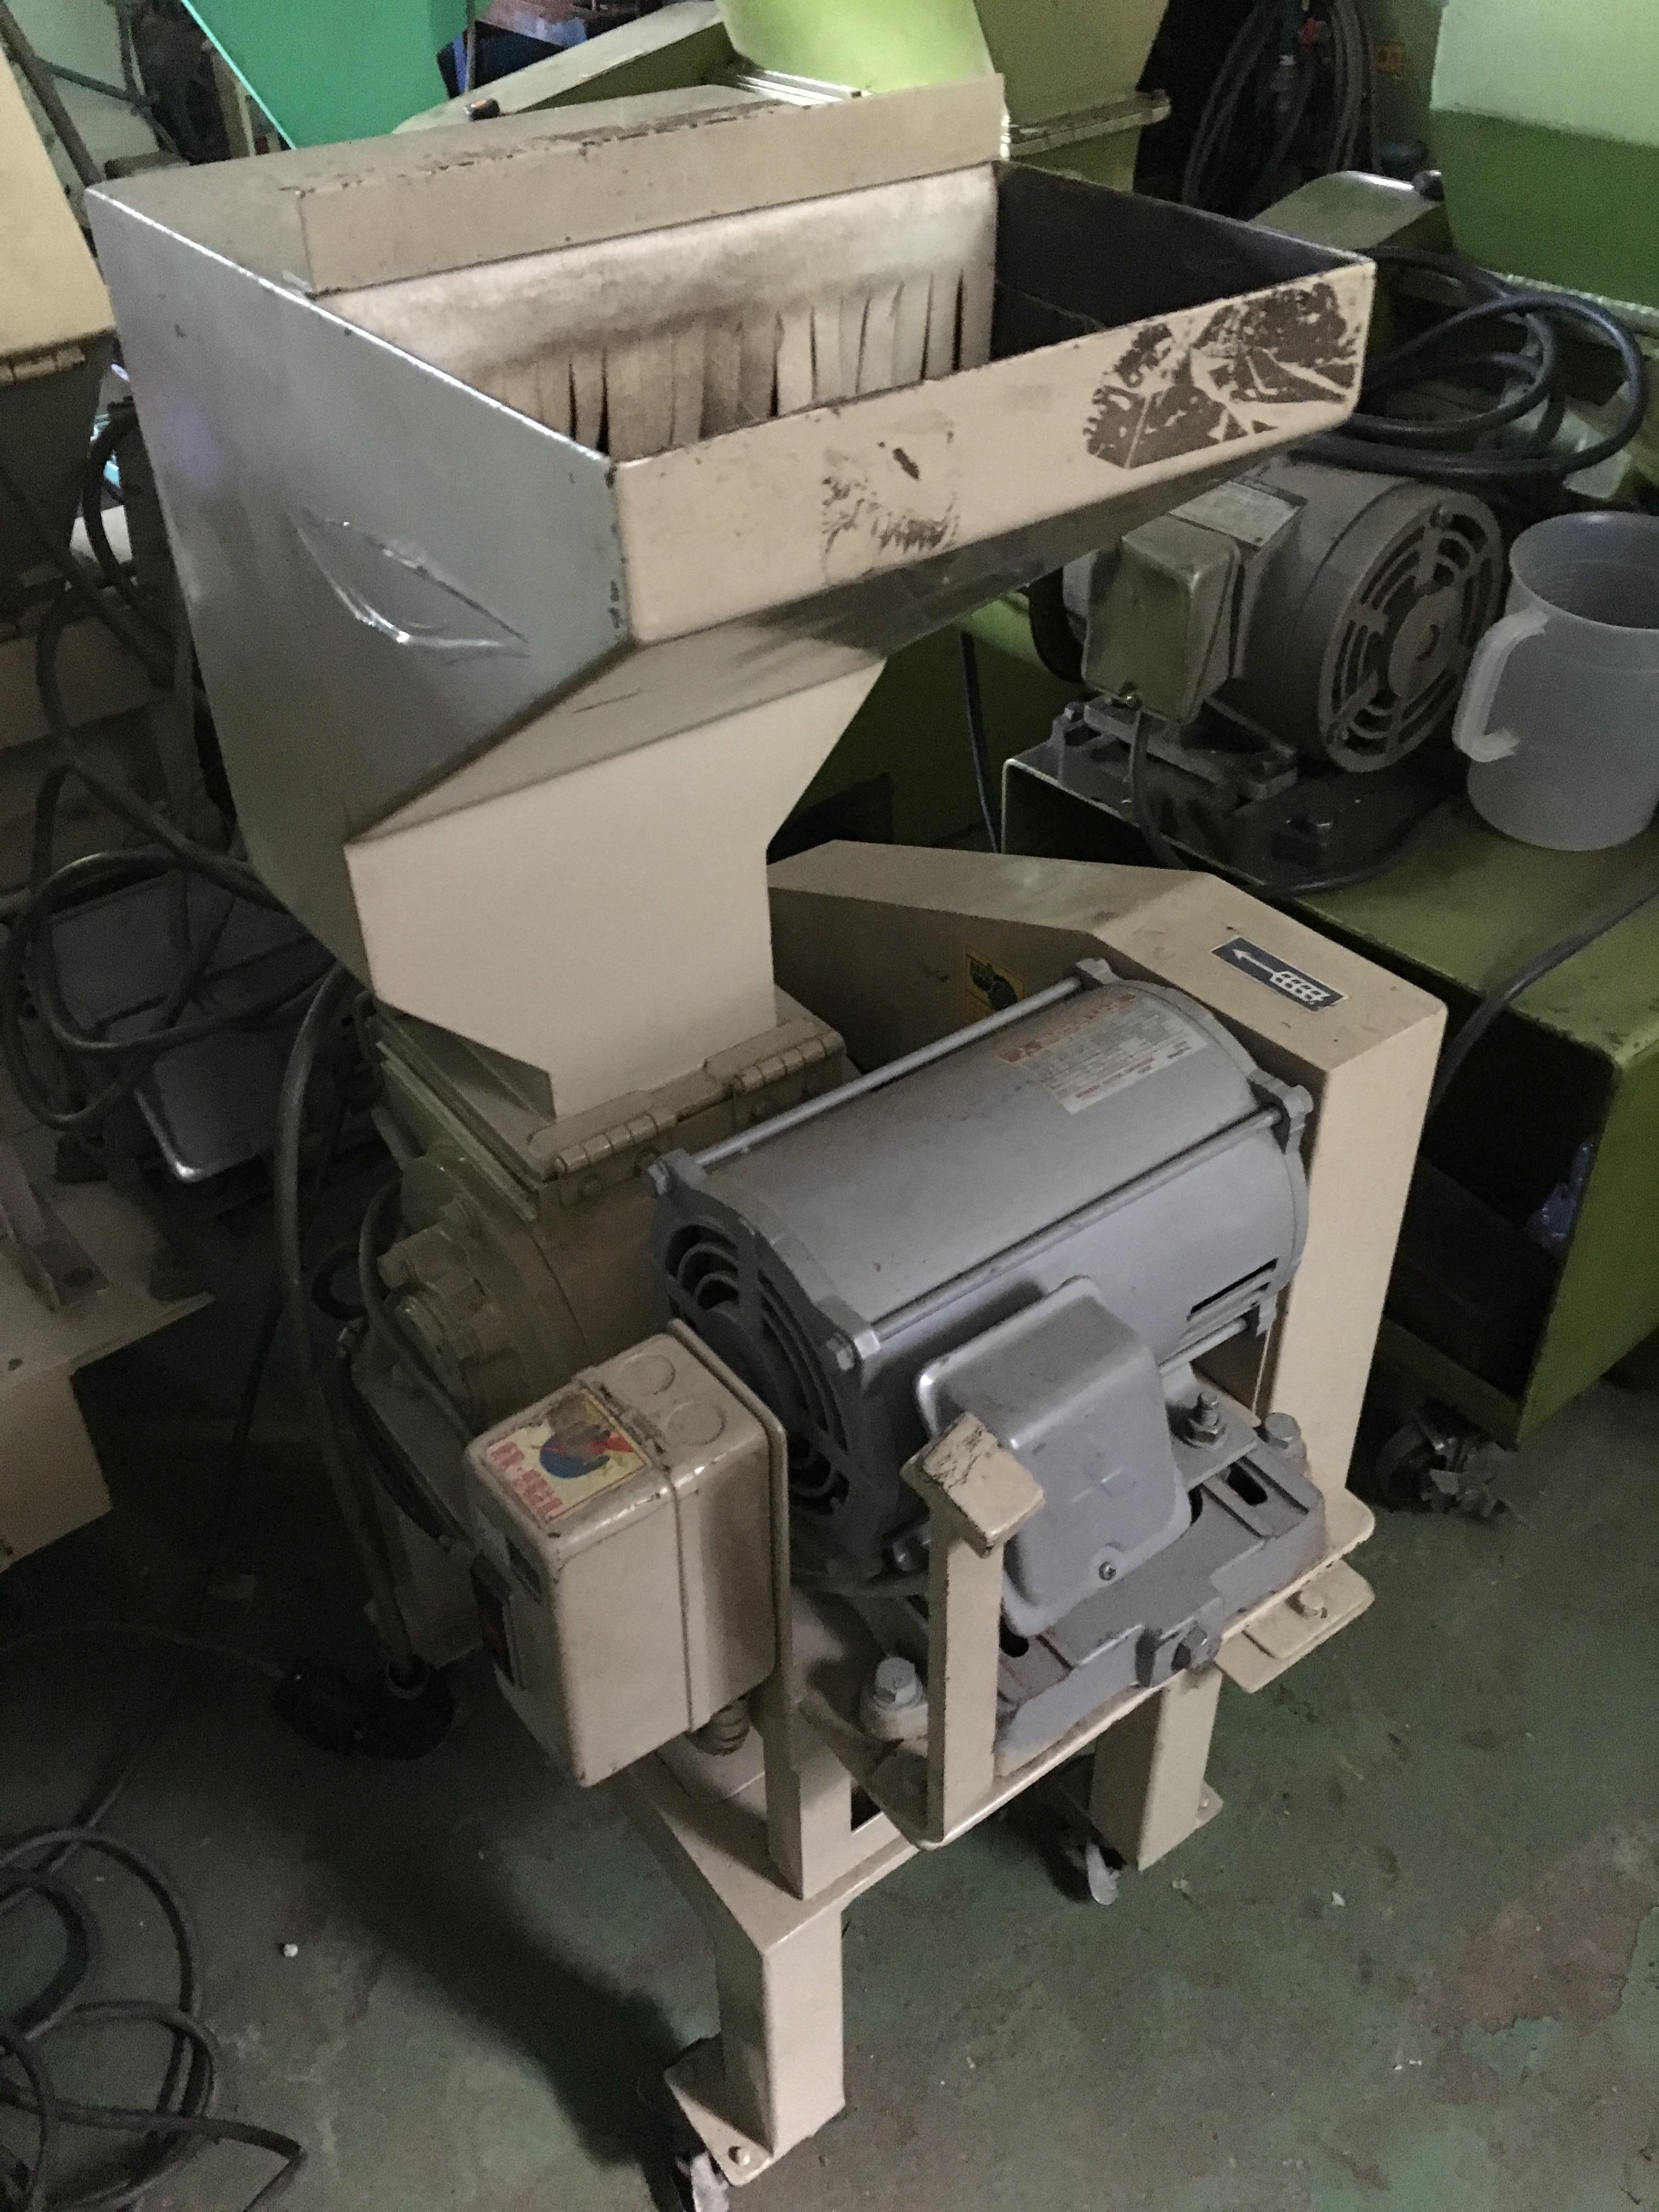 粉砕機【2902022-2】ダイコー製2馬力粉砕機DAS14